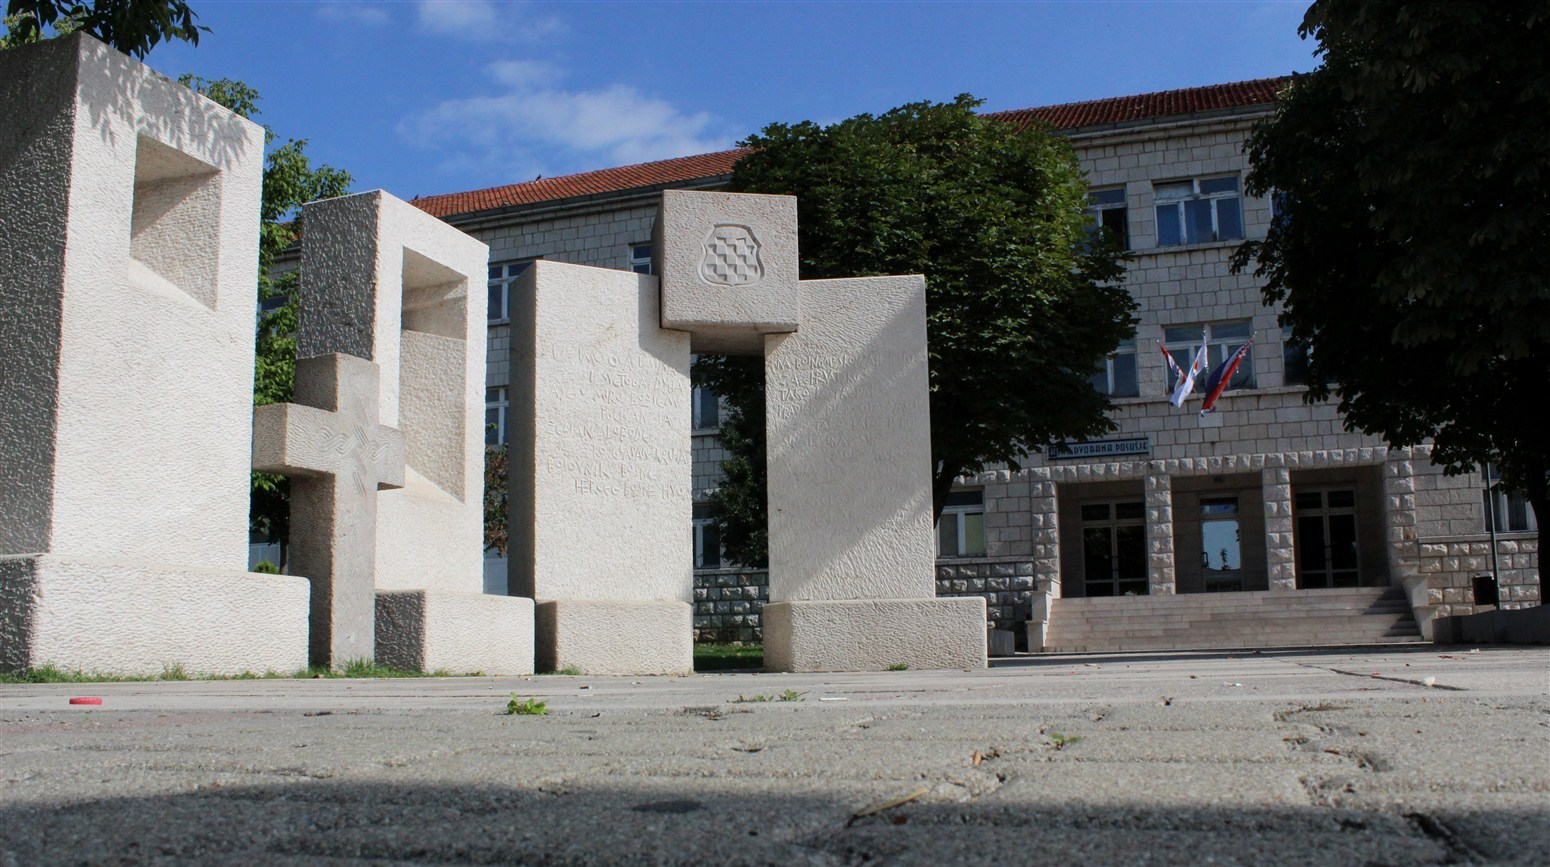 Zamolba stanovništvu – parkiranje vozila na Trgu hrvatskih branitelja